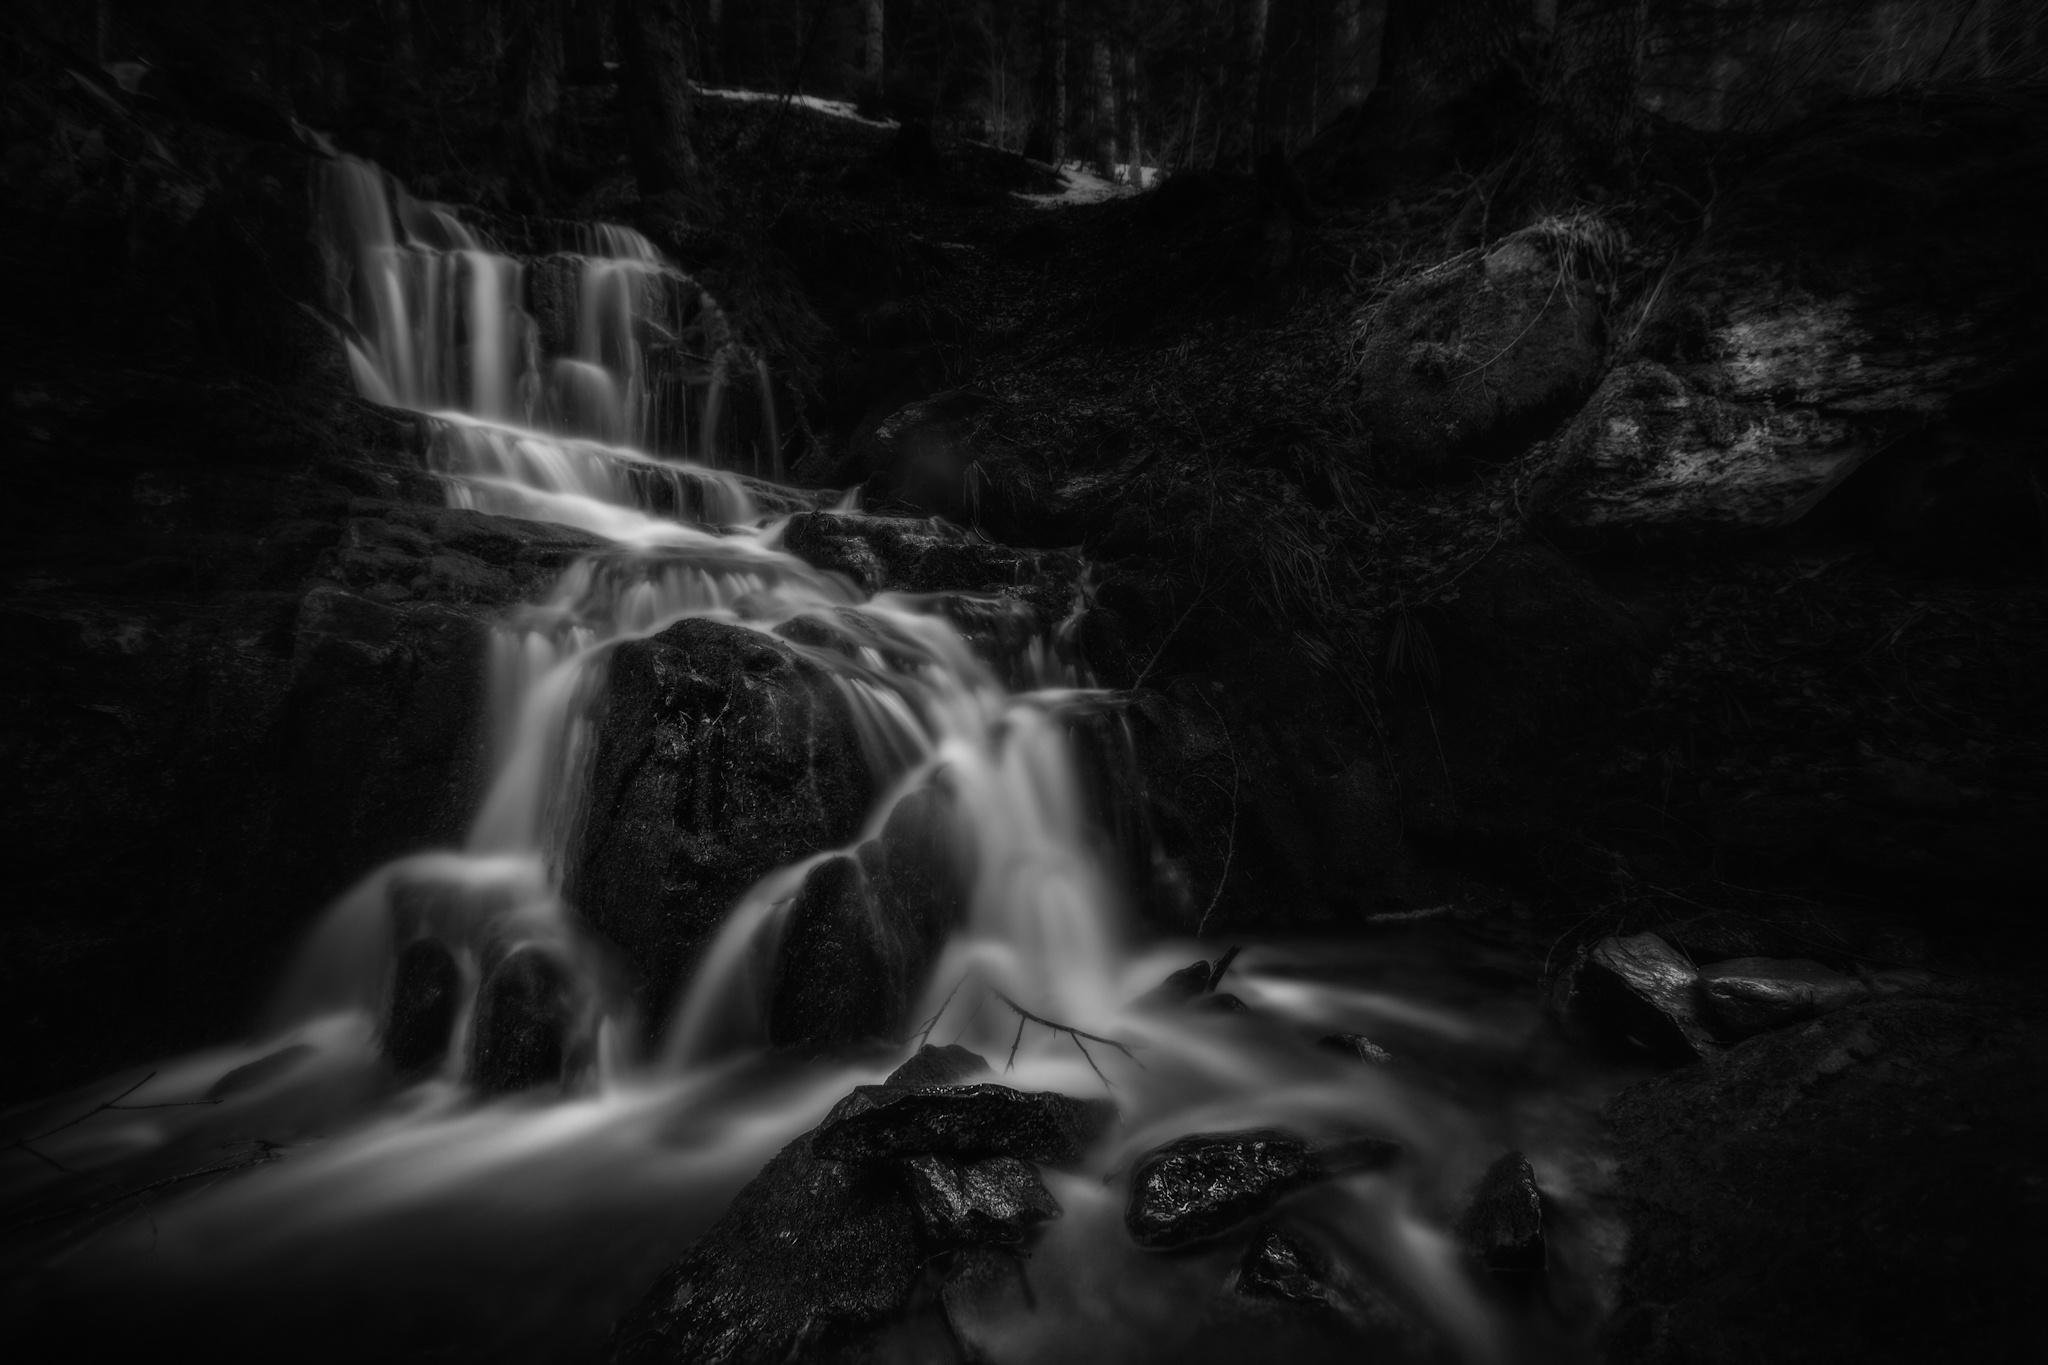 Cascada Sansanet - Vallée d´Aspe - Fotos del Valle del Aragón, Mikel Besga